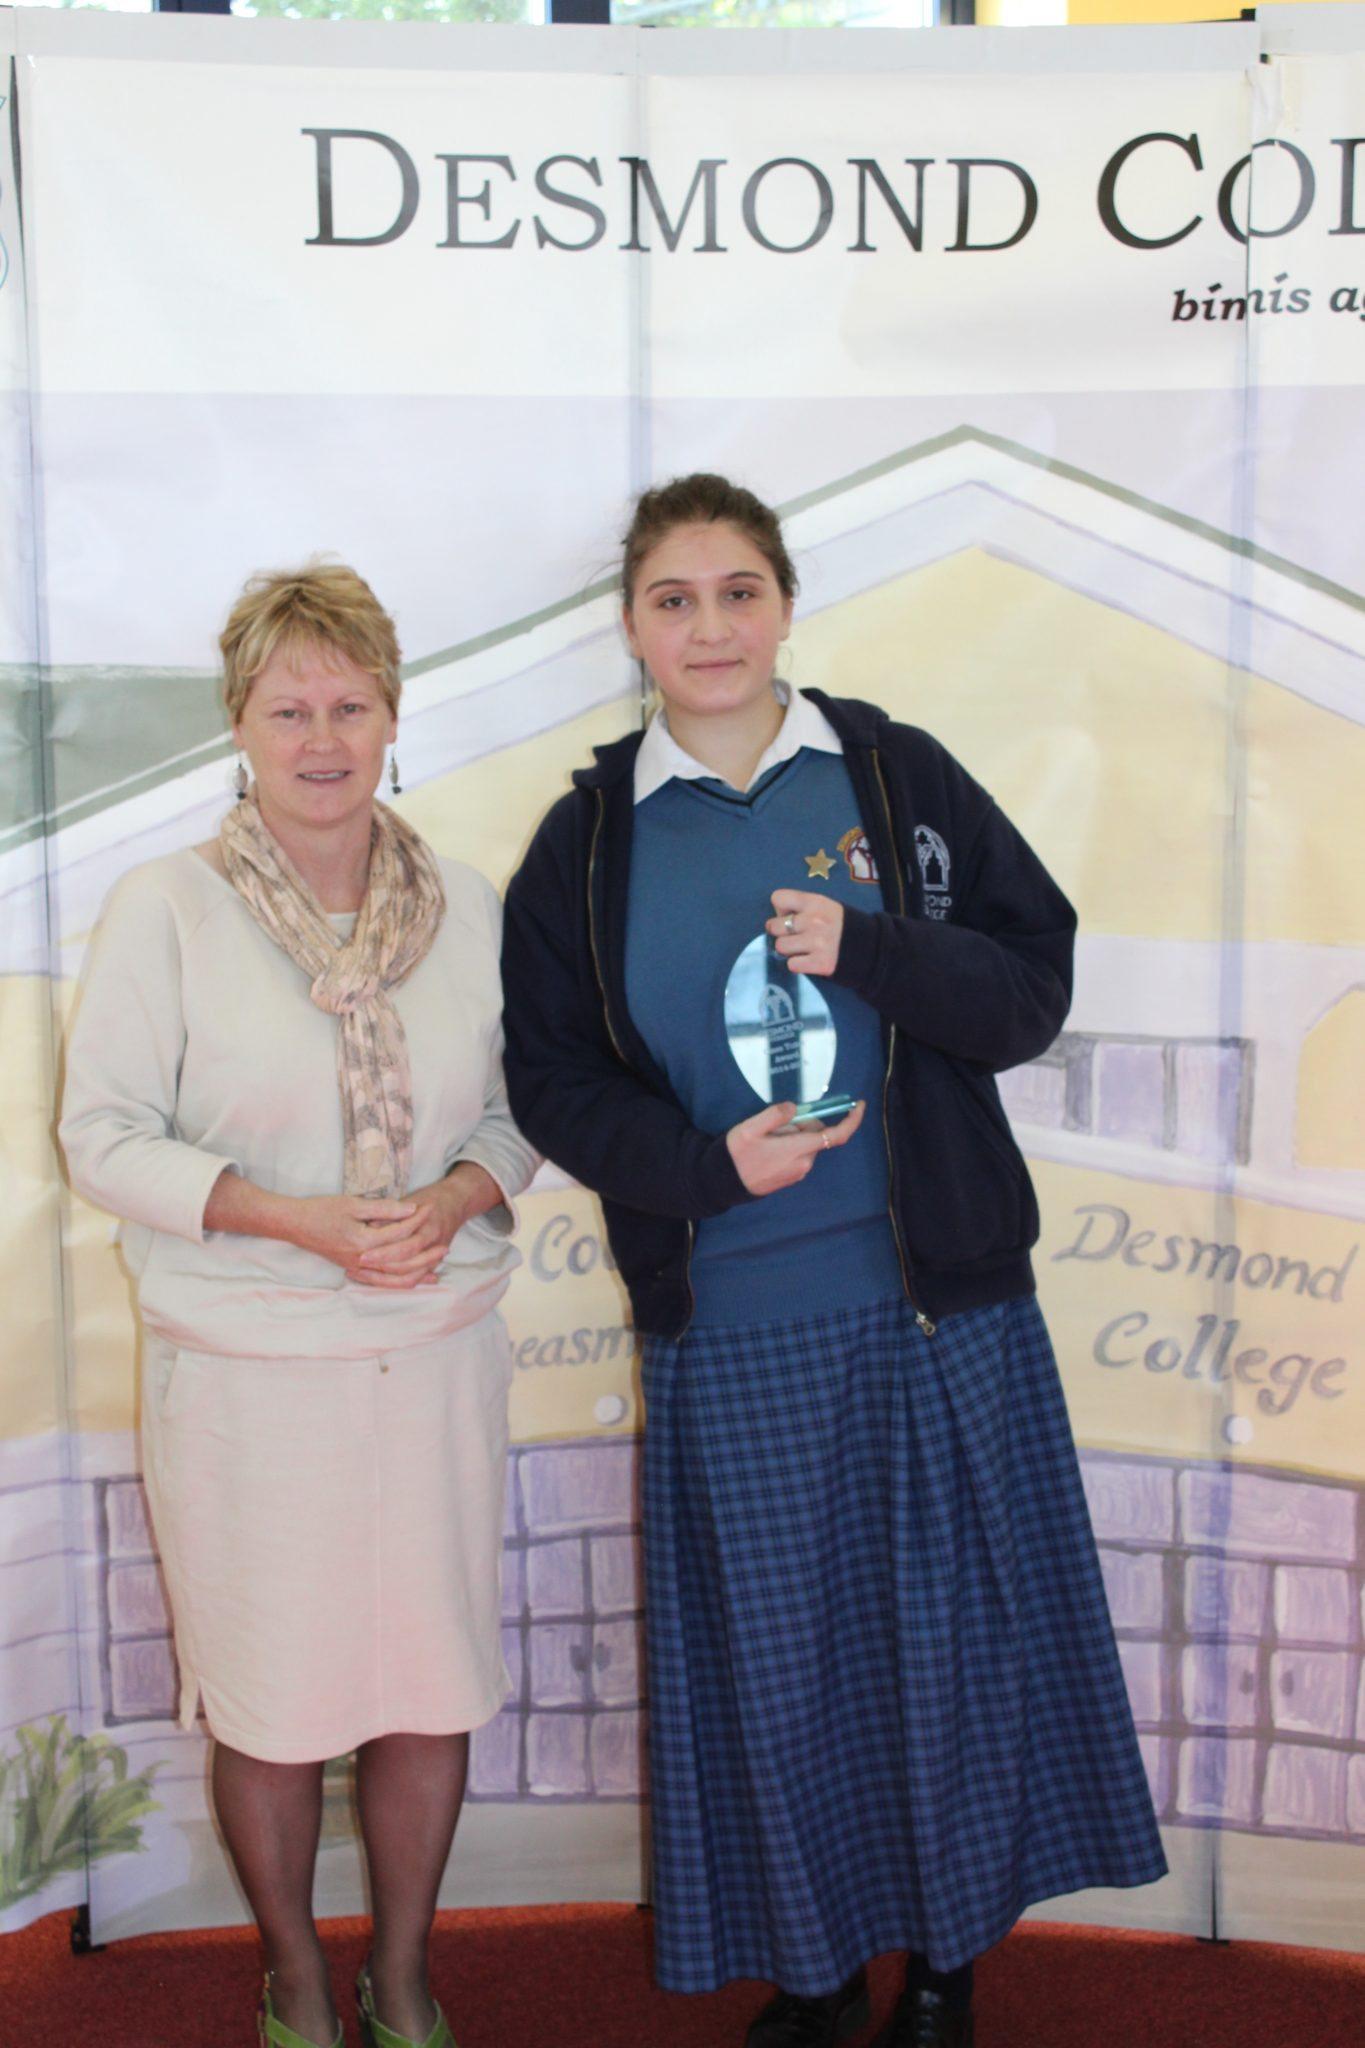 Desmond College Student Awards: May 2015: TUTOR AWARDS 5th Year : Muinteoir Siobhán with Anna Maria Conversano